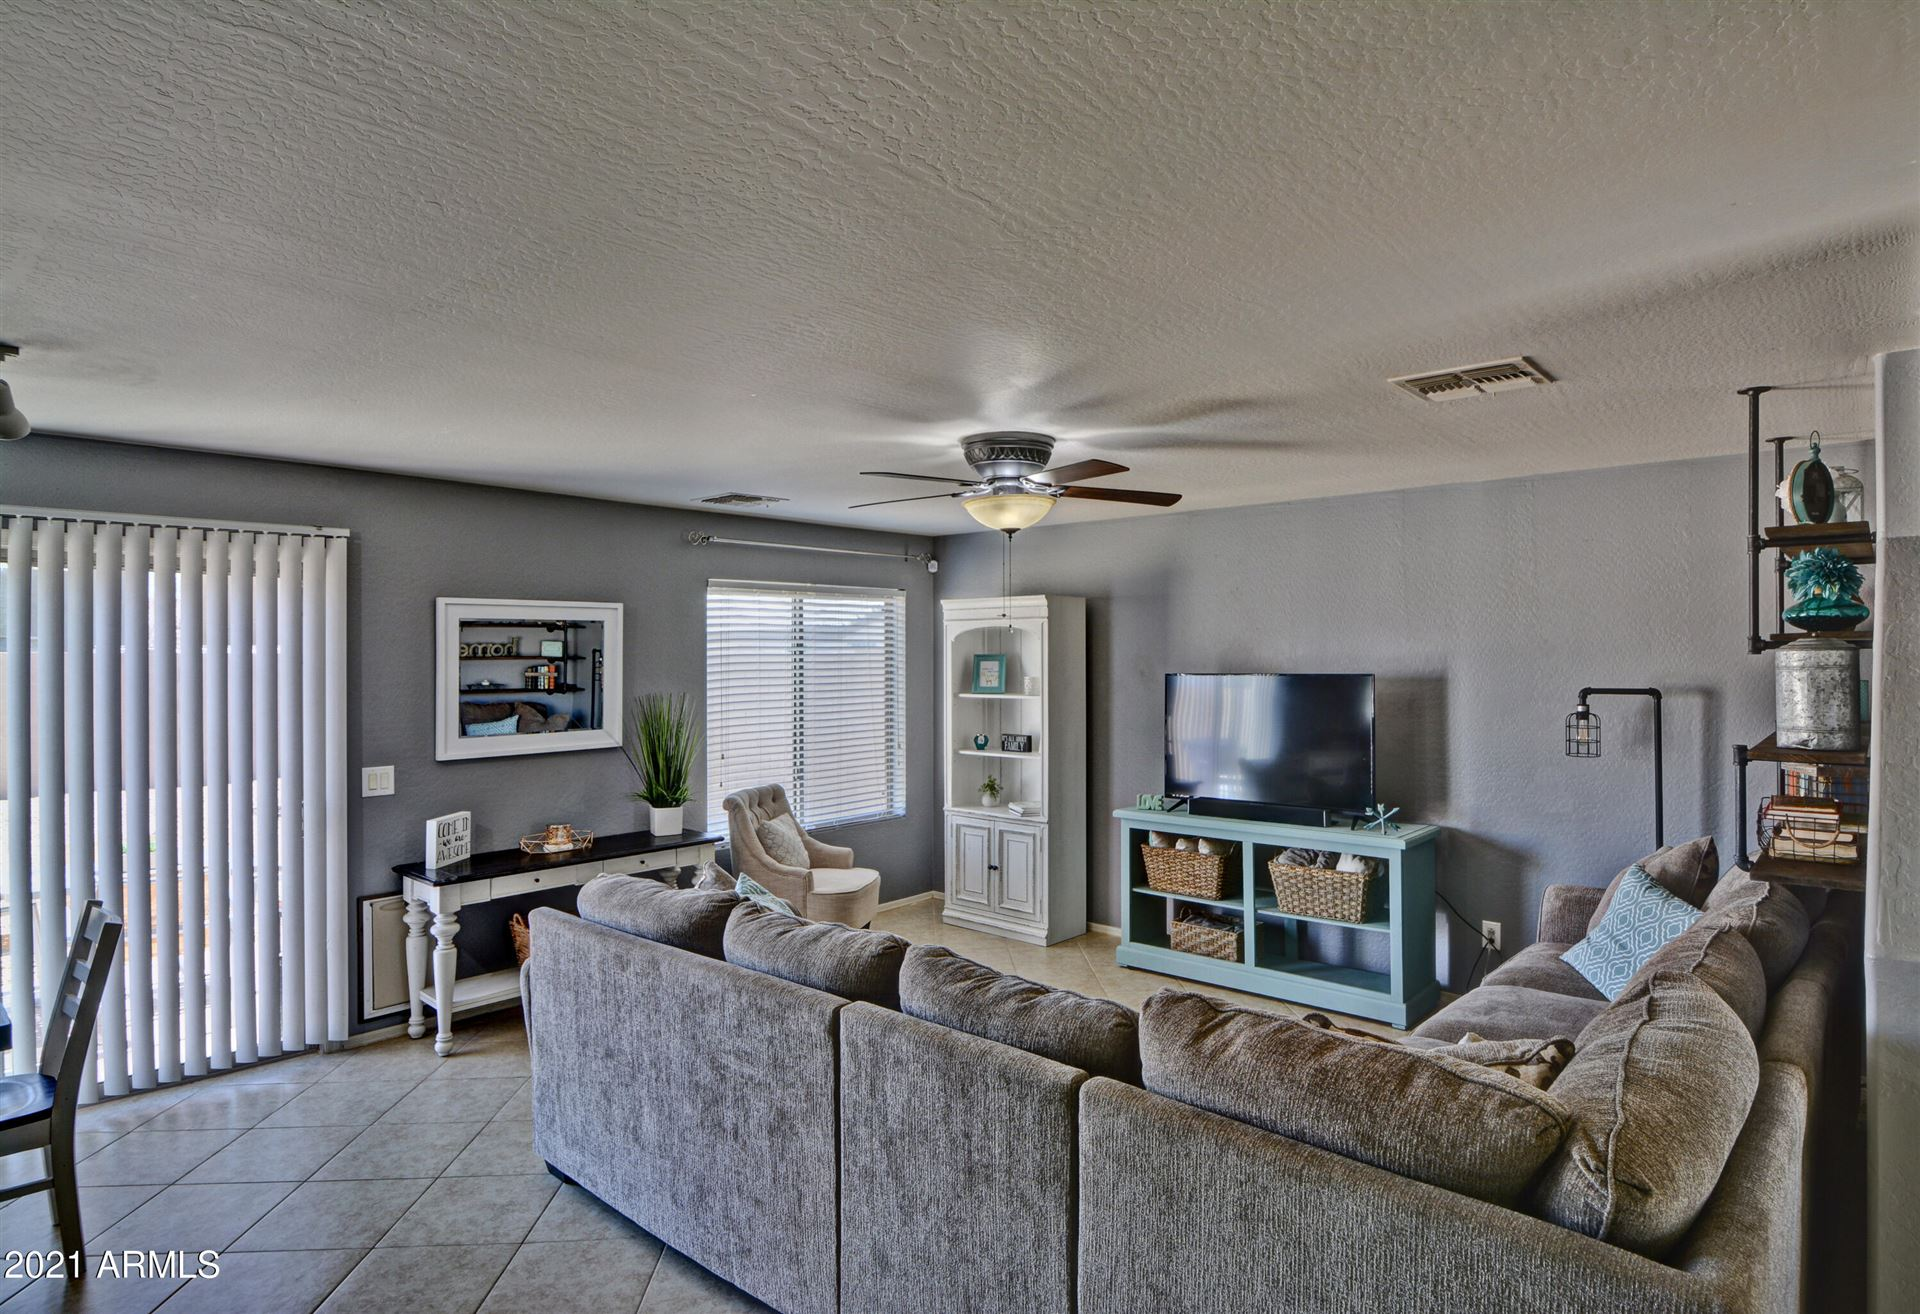 Photo of 15219 N B Court, El Mirage, AZ 85335 (MLS # 6195674)